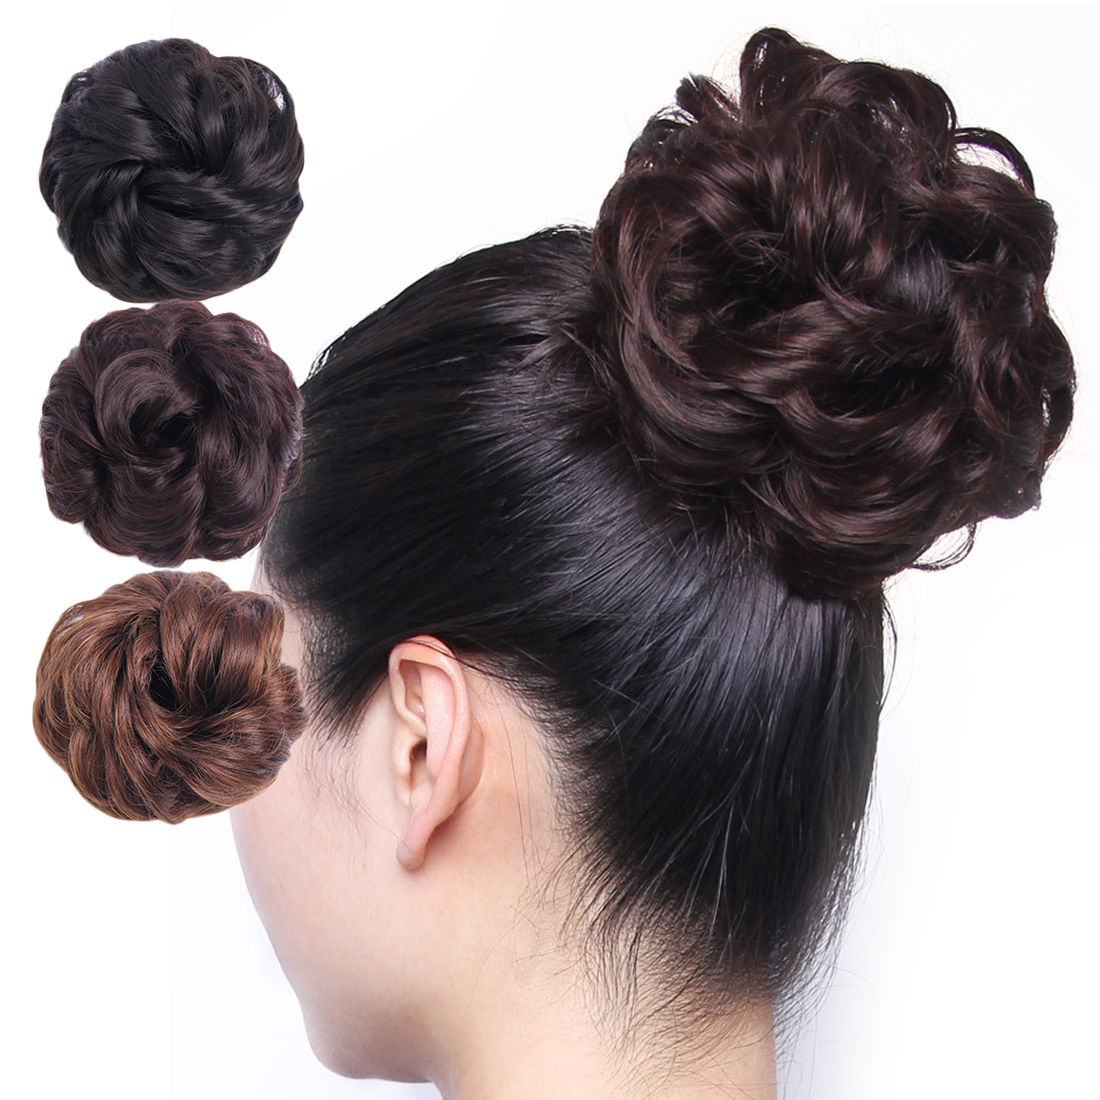 2Pcs Girls Magic Donut Hair Bun Ring Styling Maker Beauty Tool Scrunchie Holder